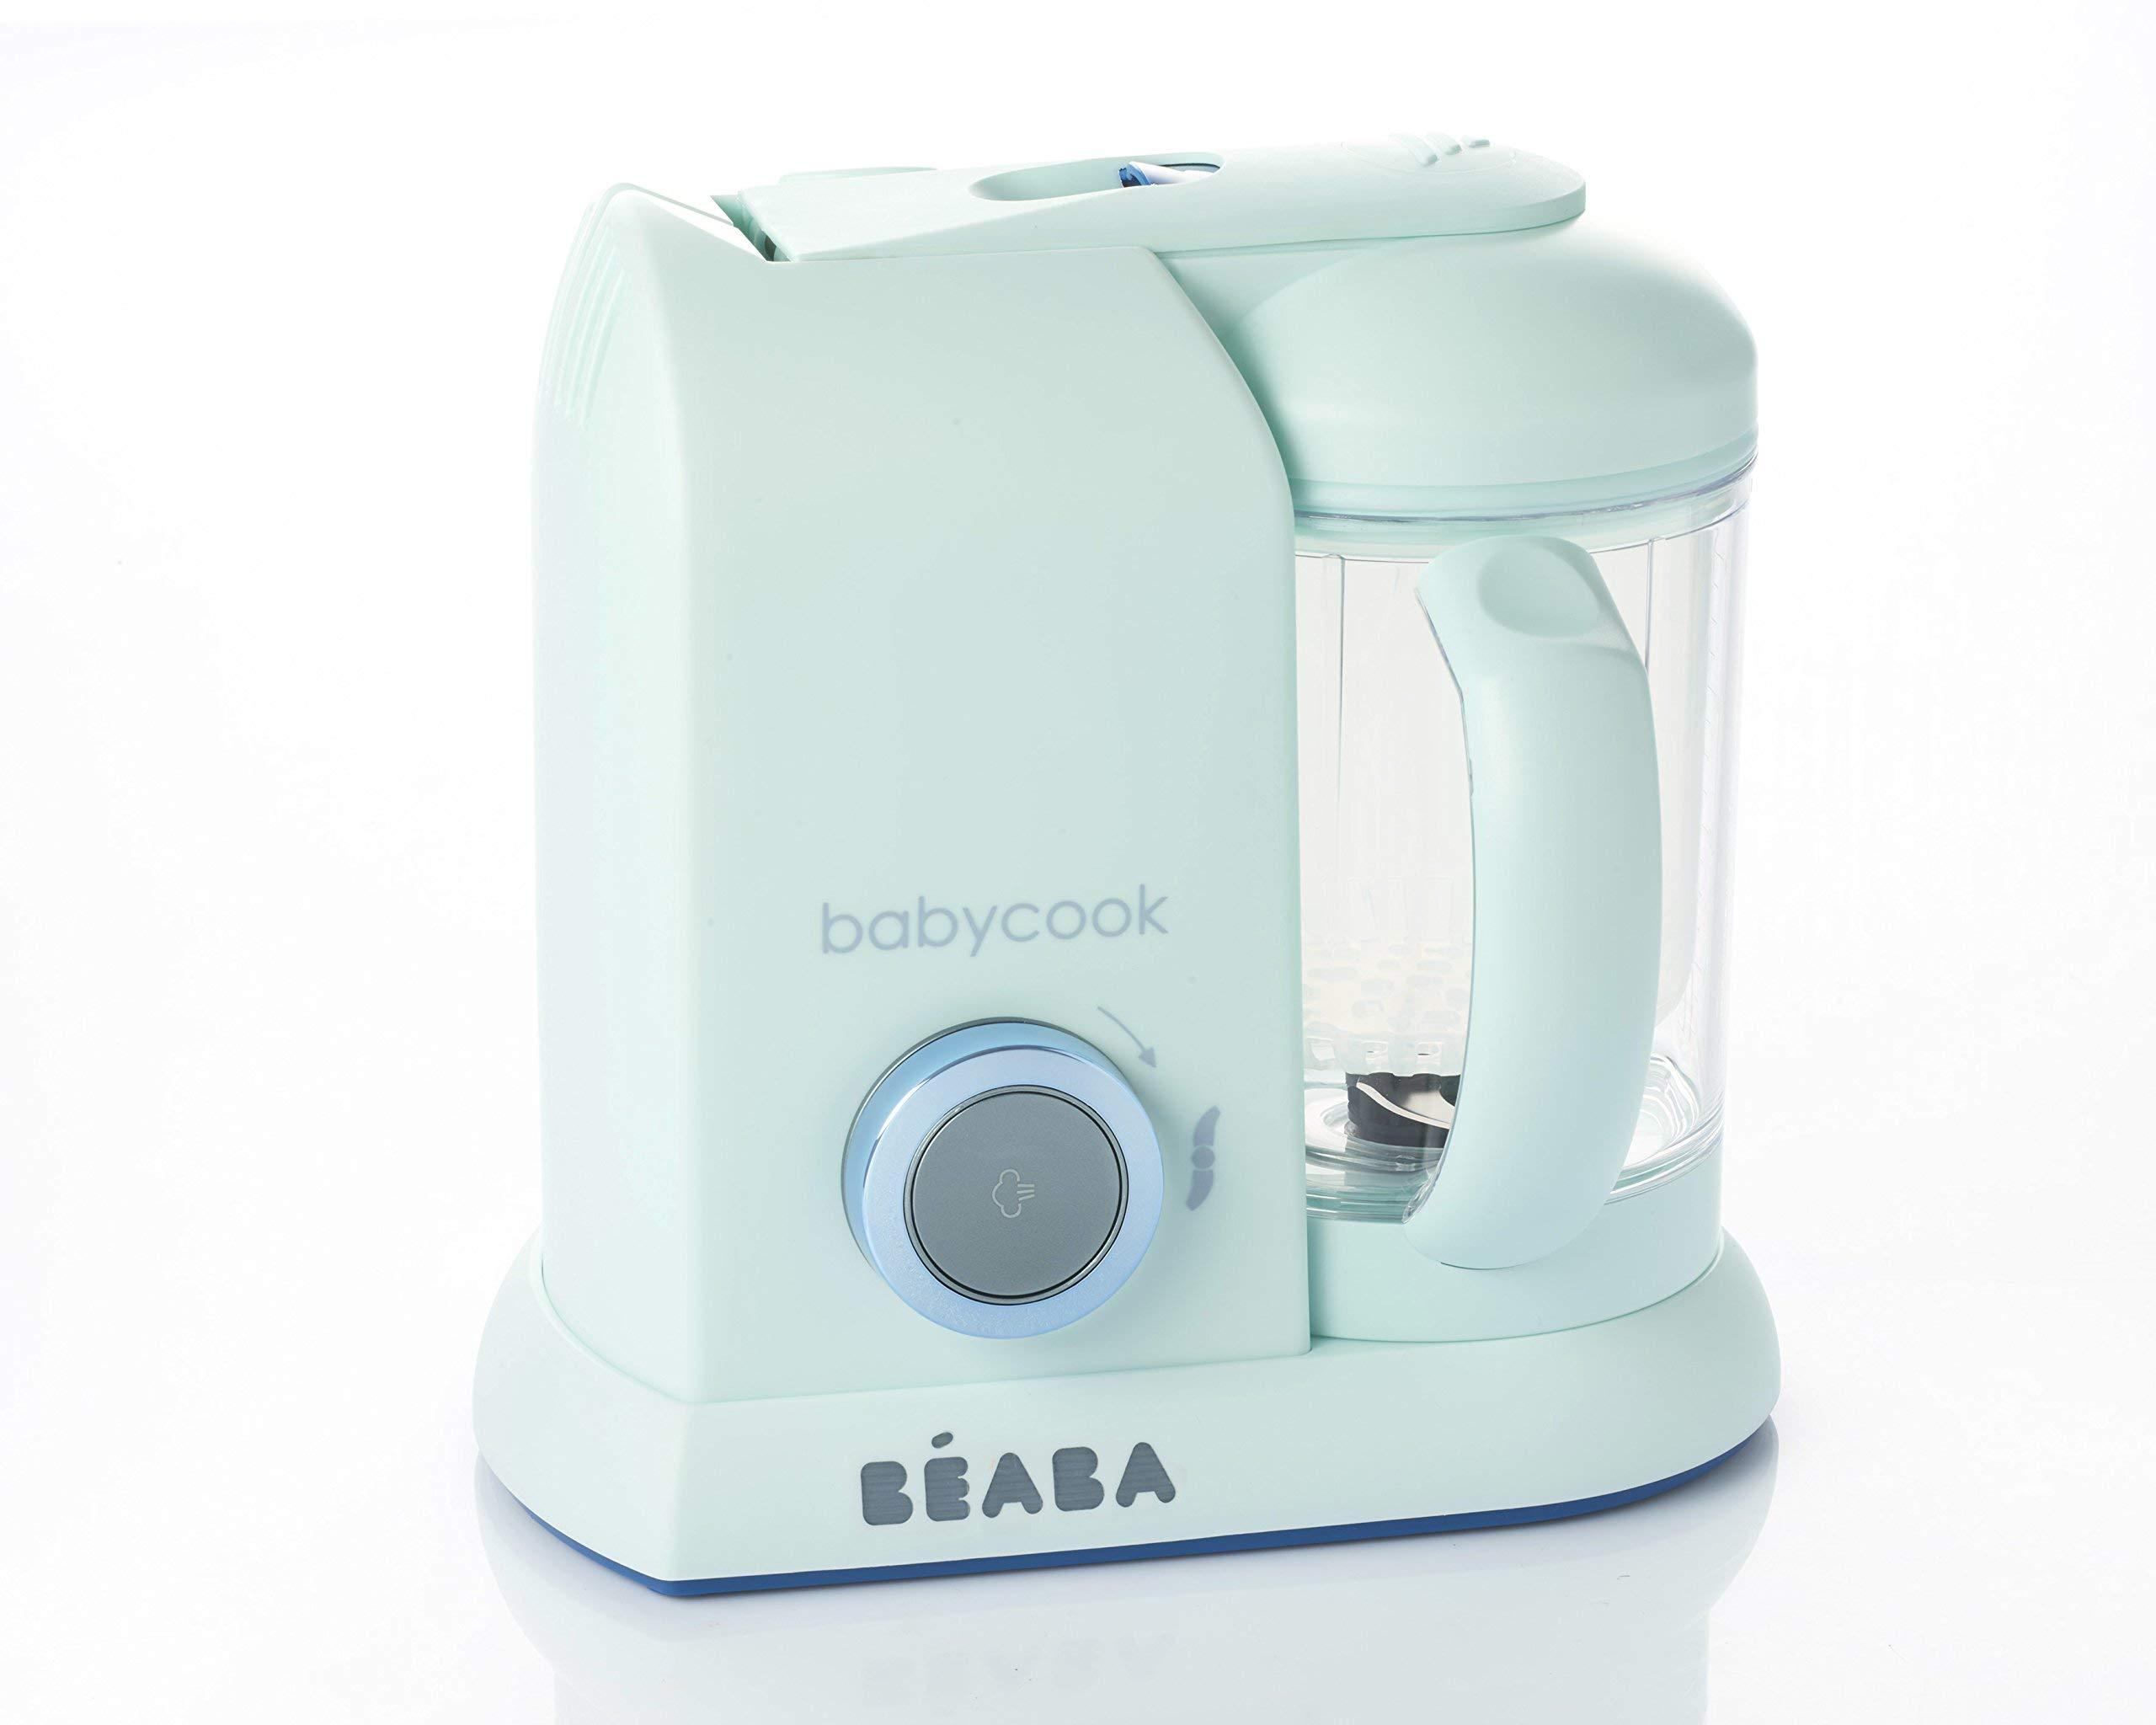 BEABA Babycook - Red (Certified Refurbished)